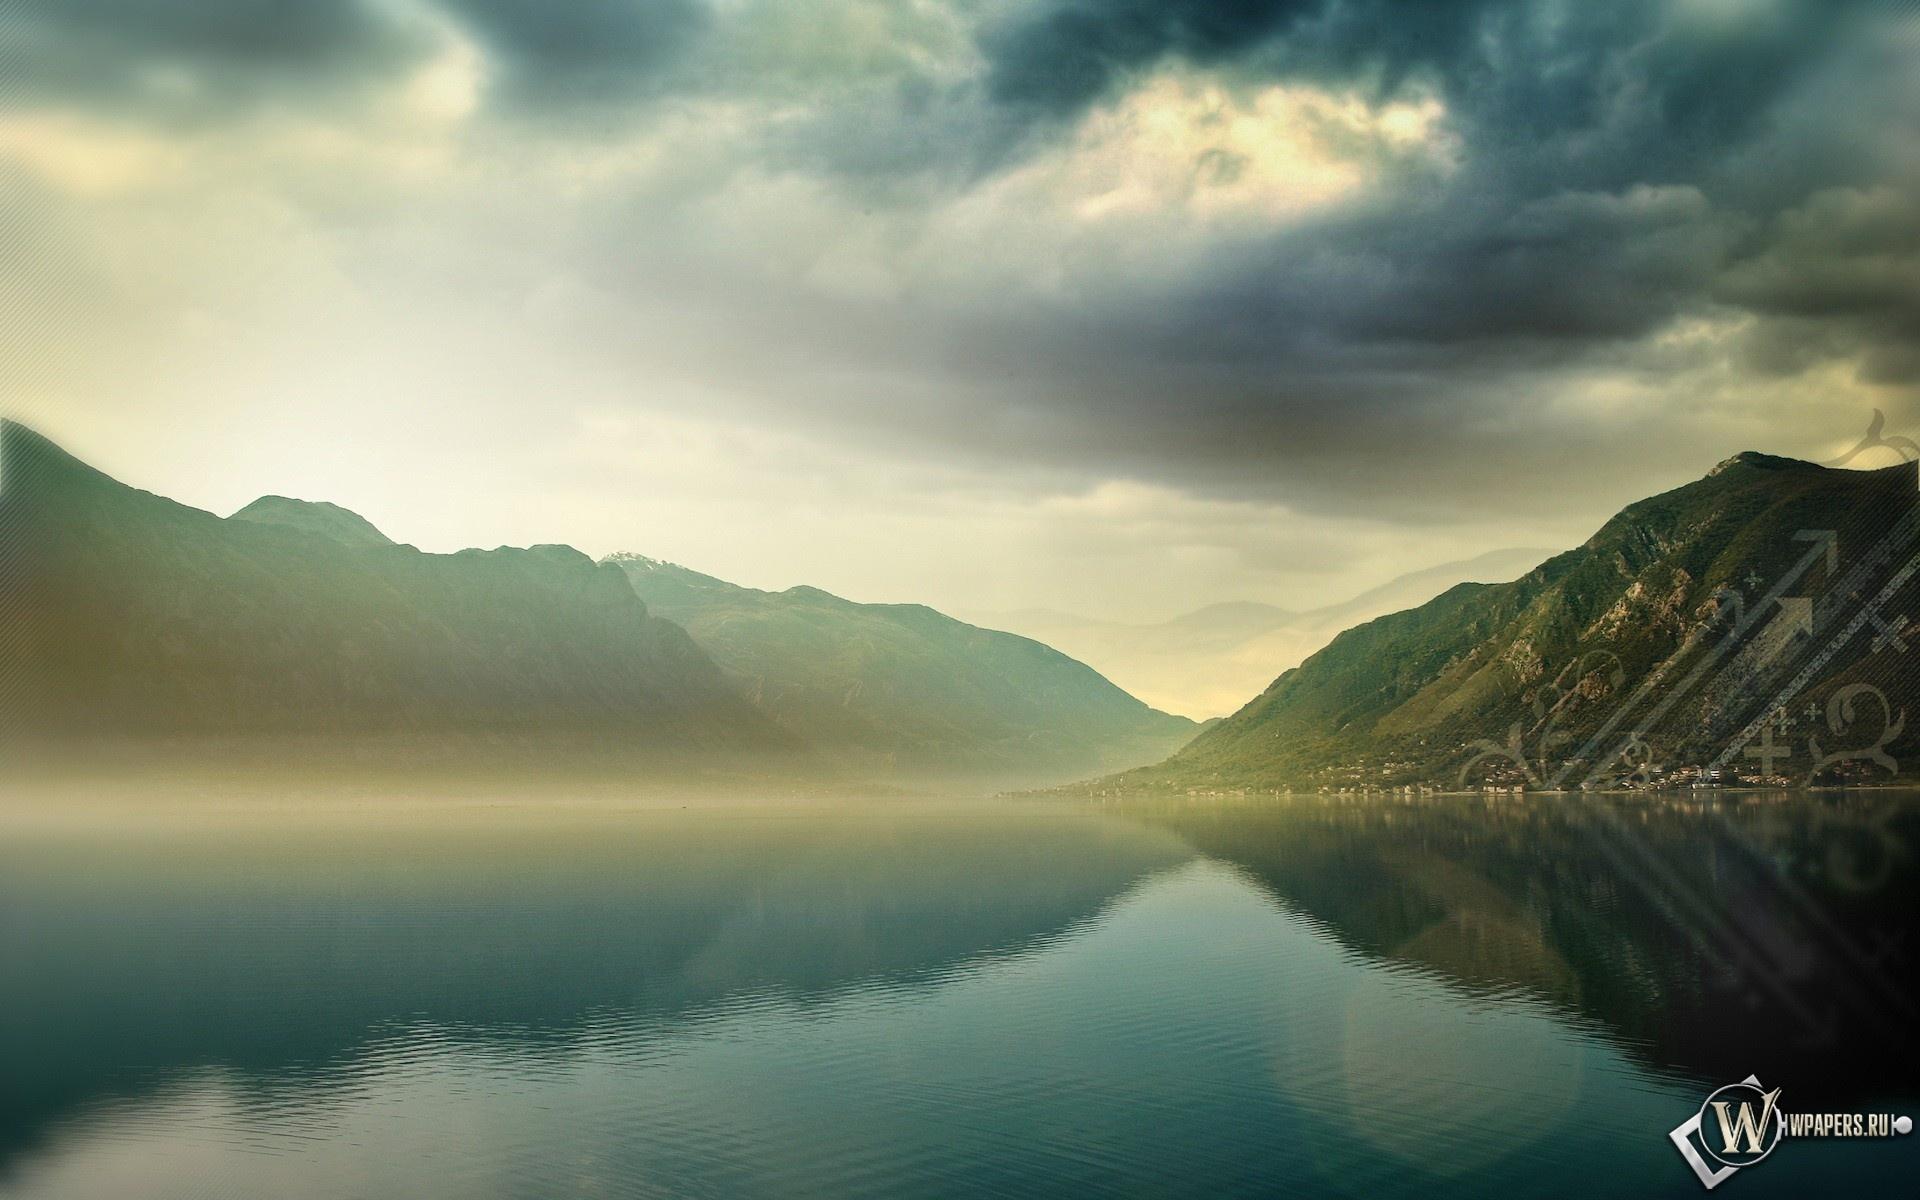 Туман над горным озером 1920x1200